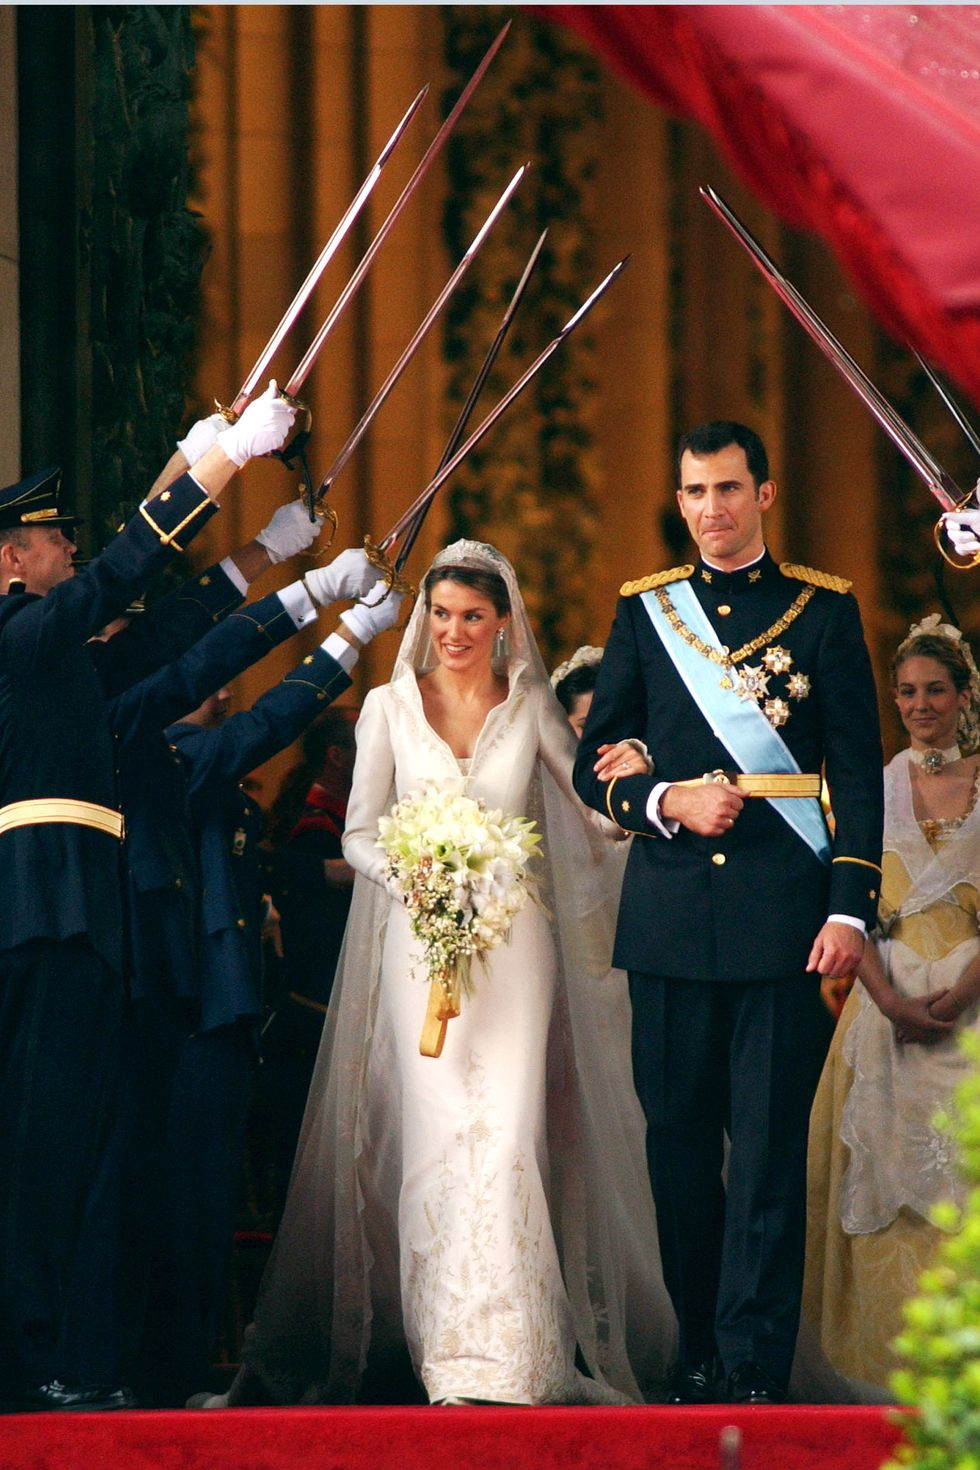 King Felipe & Queen Letizia Ortiz of Spain